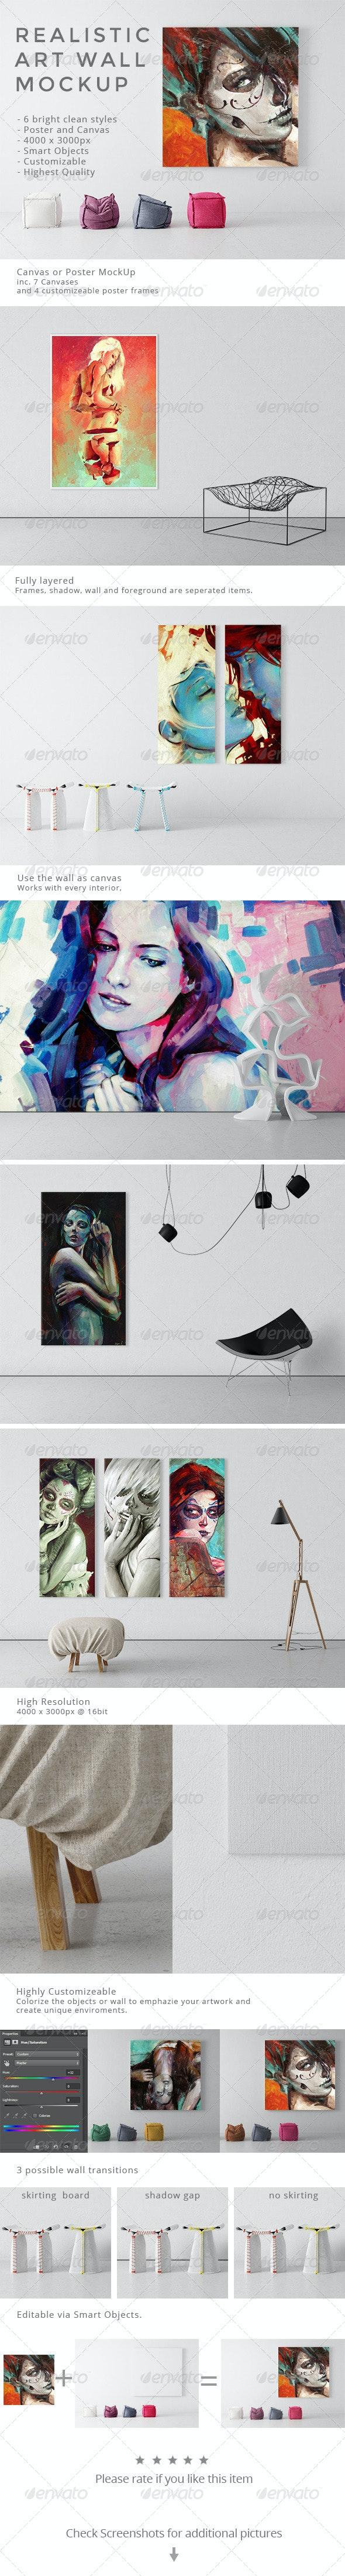 Realistic Art Wall Mock-Up - Miscellaneous Print